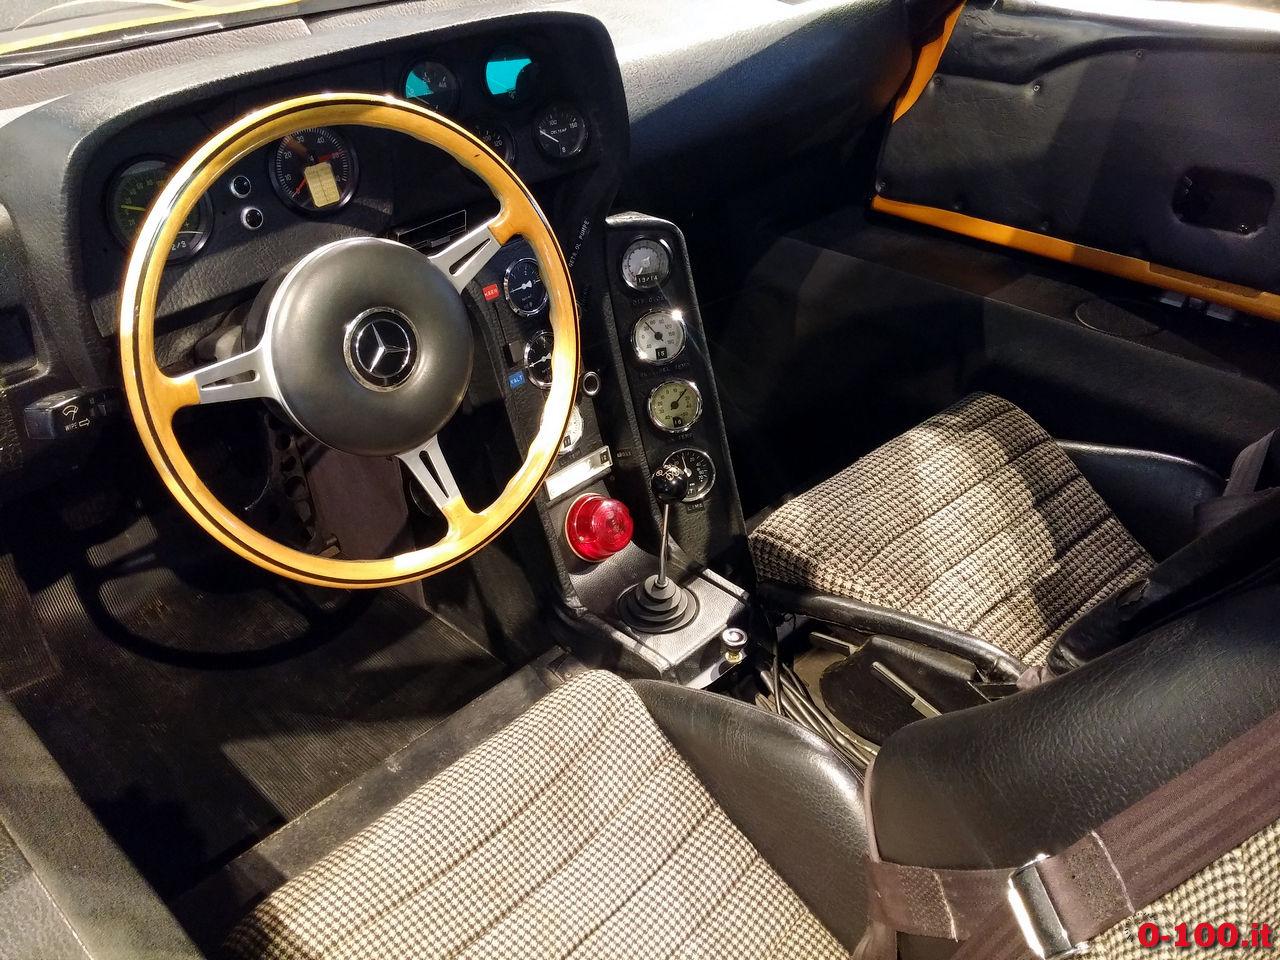 automotodepoca-2016-mercedes-car-market-mercato-auto-prezzo-price_0-10015